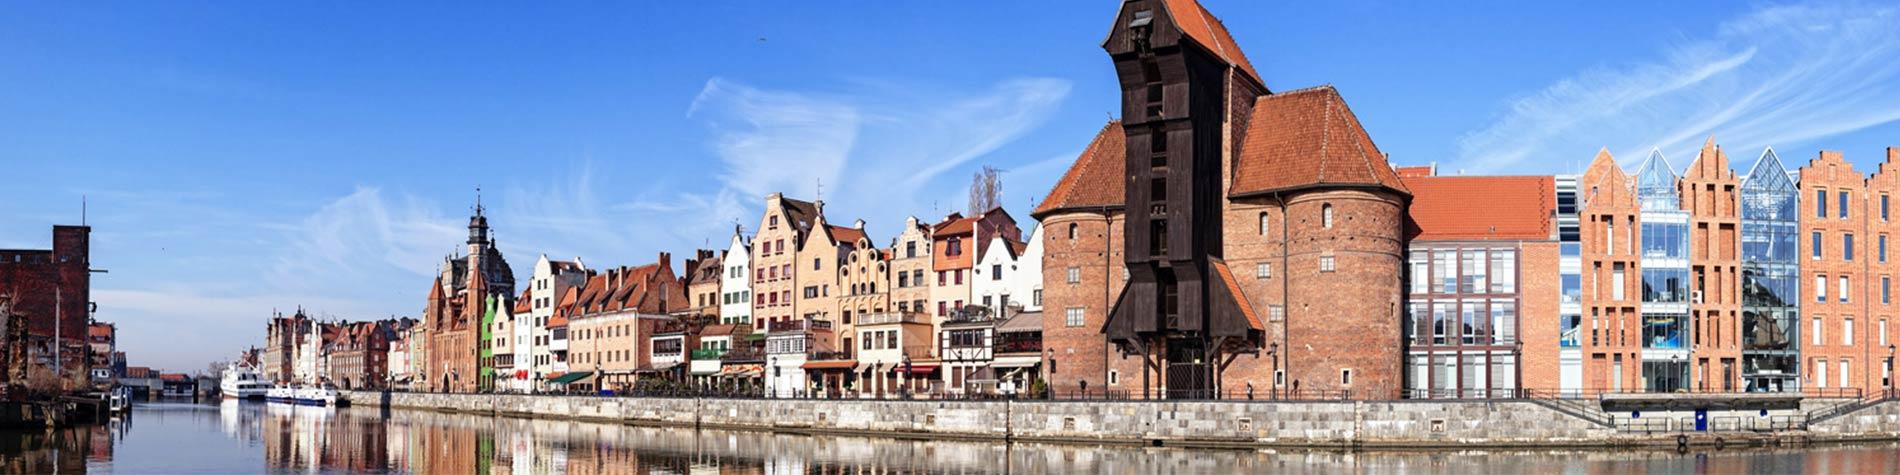 Cheap flights to Gdansk (GDN) from €9 95 | Ryanair com